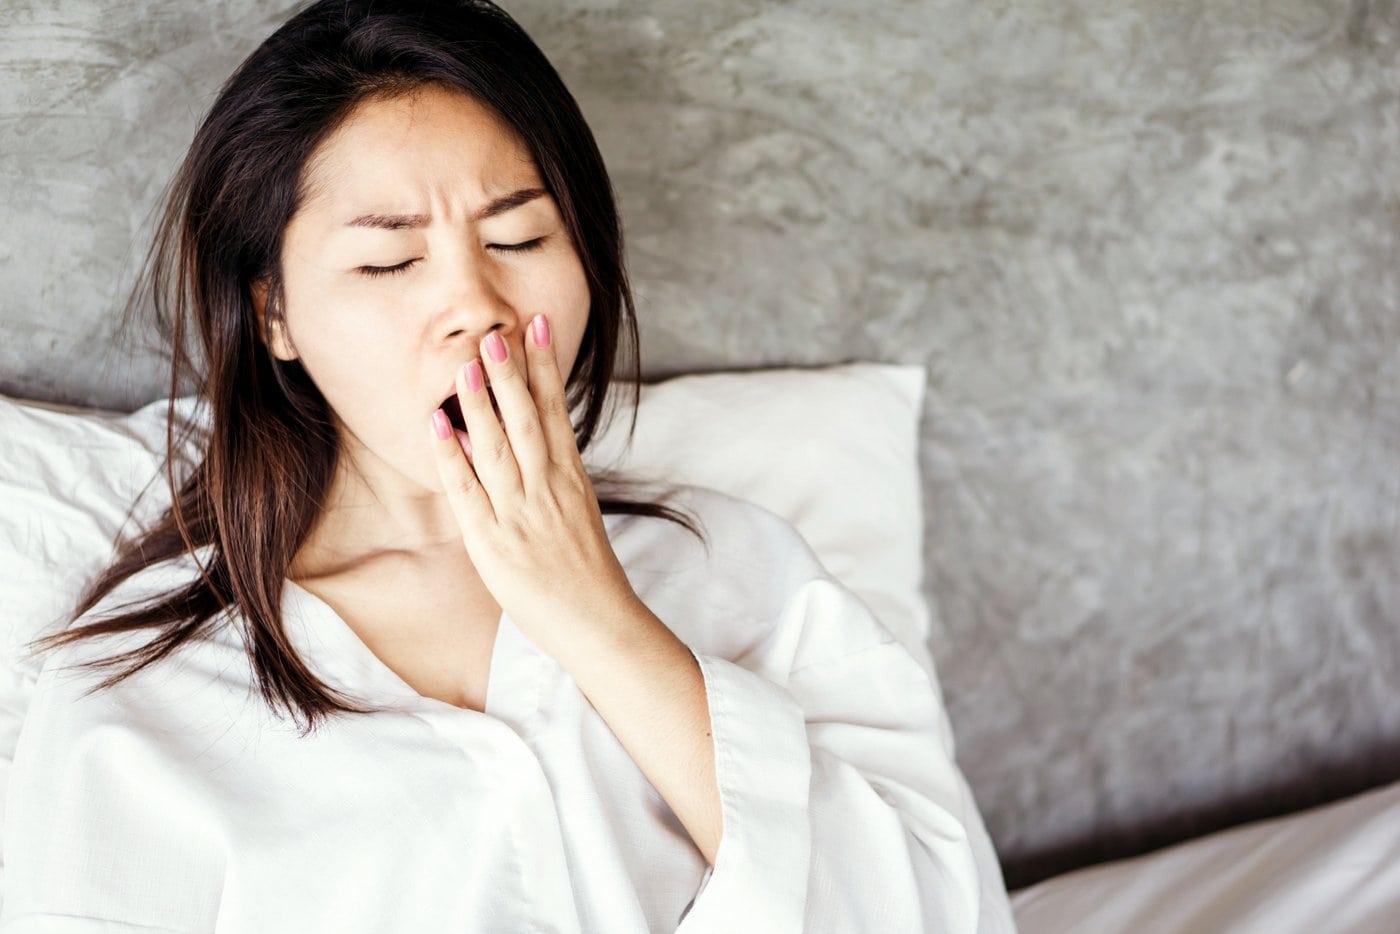 Why do we yawn?